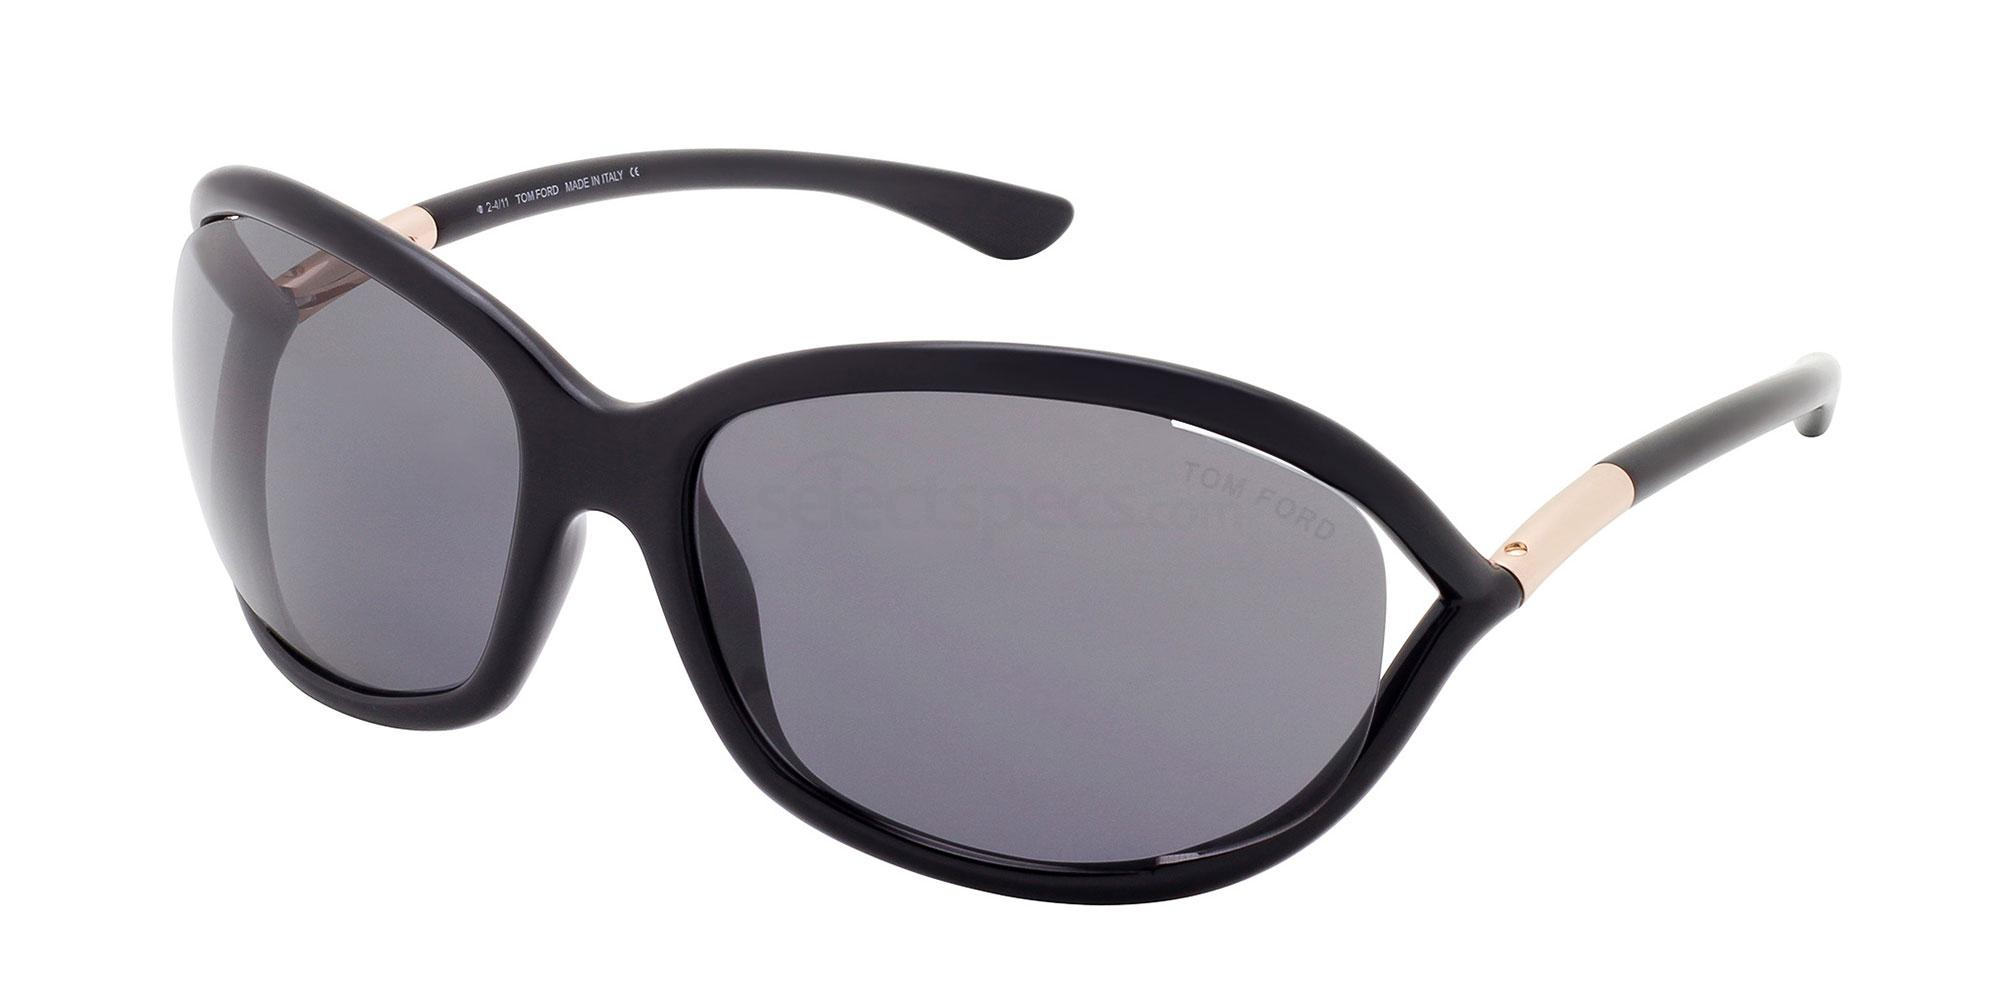 01D FT0008 Jennifer (2/2) Sunglasses, Tom Ford